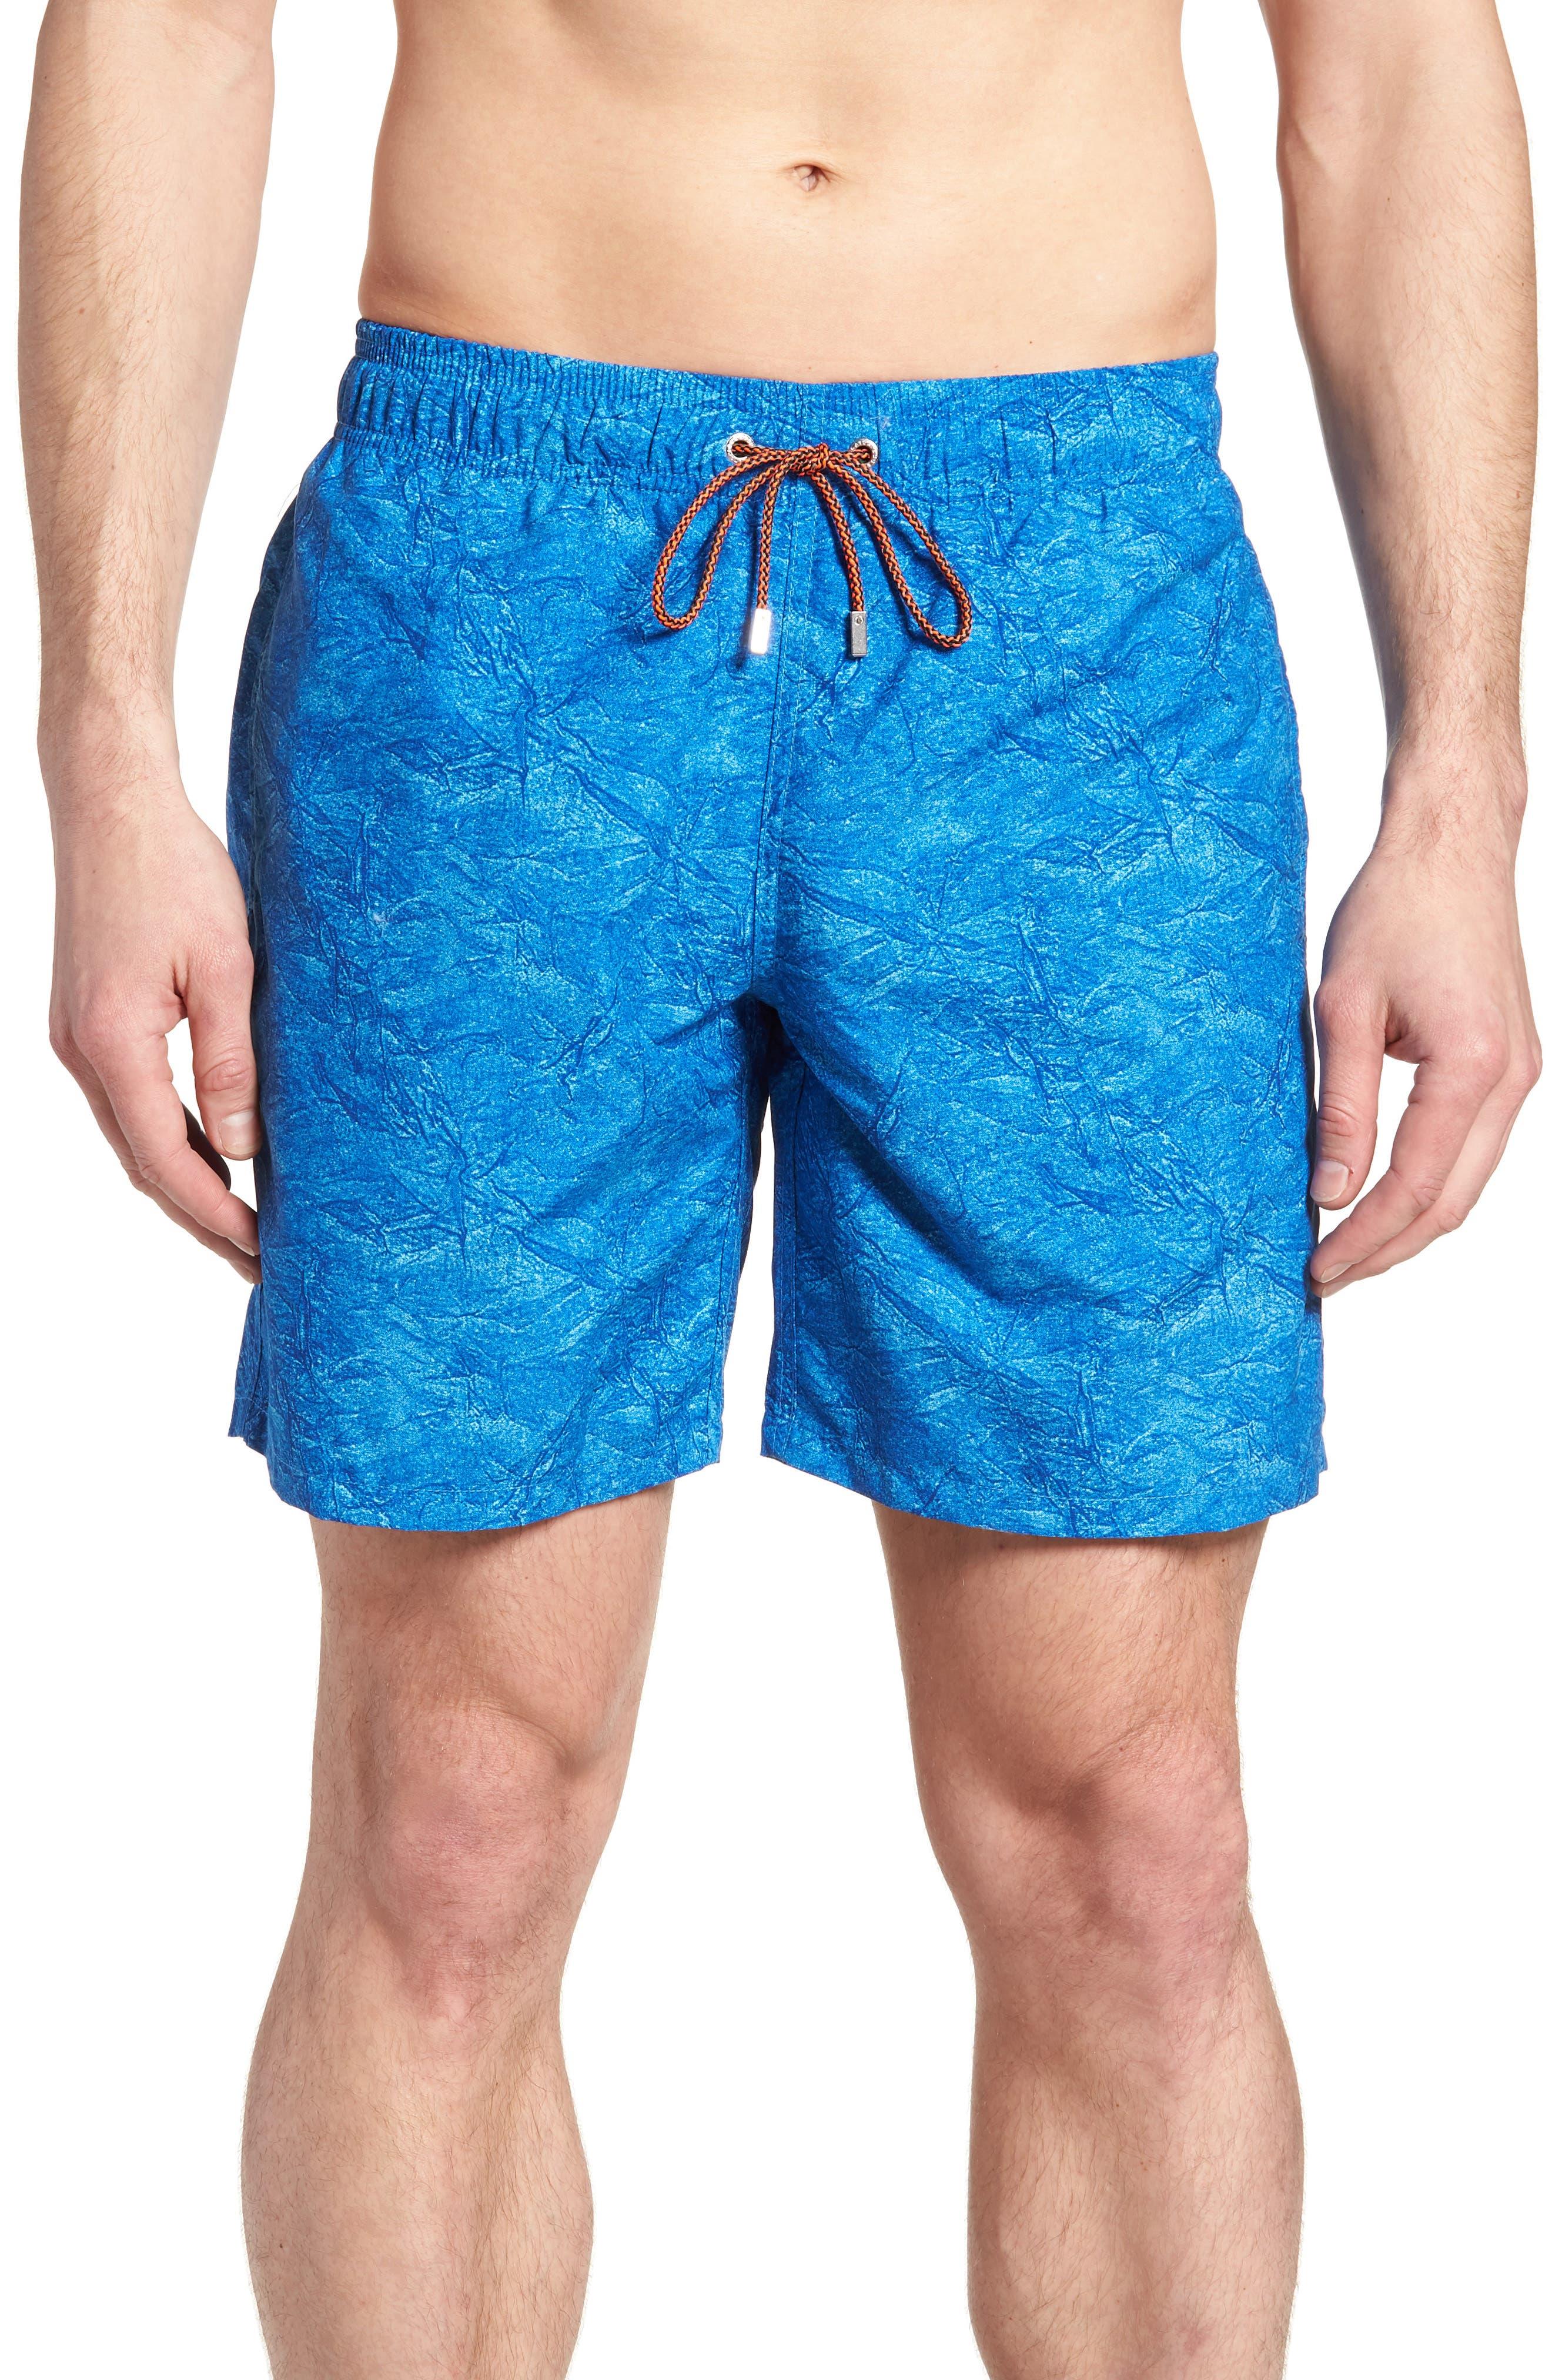 Marble Mood Swim Trunks,                         Main,                         color, Ocean